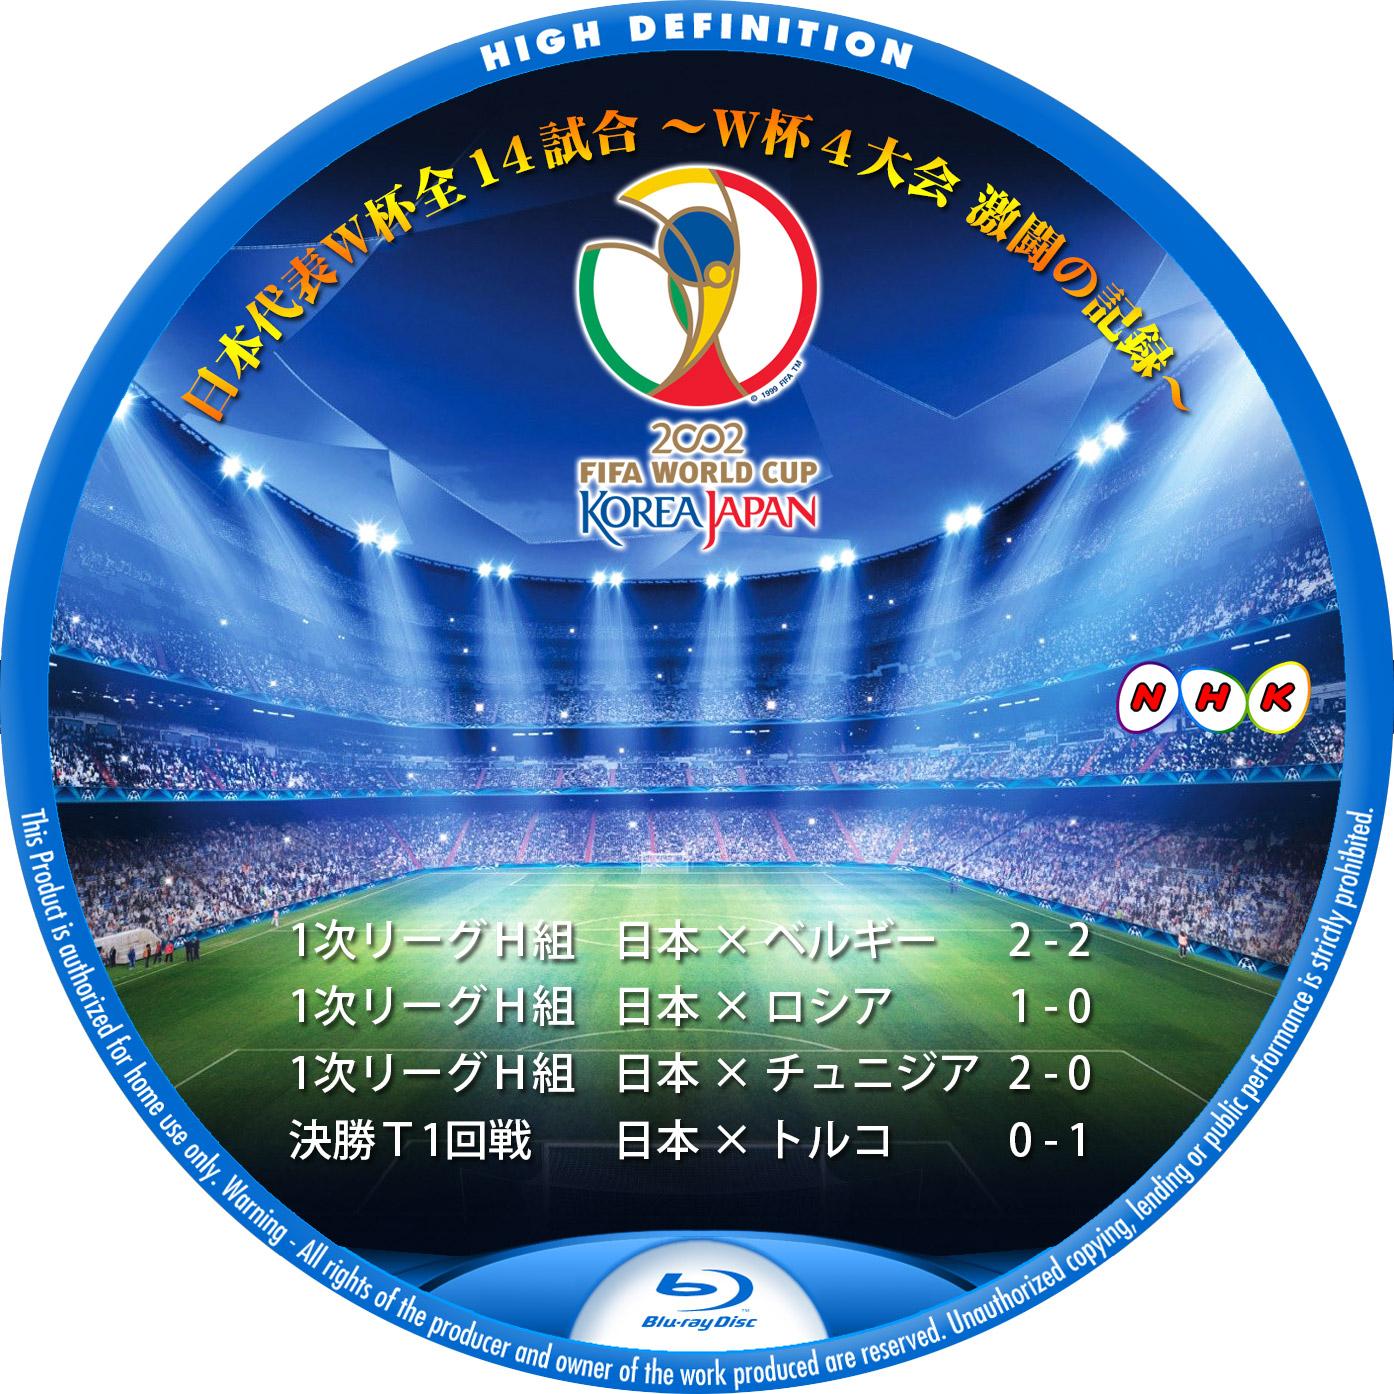 World Cup 2002 日本代表 ラベル